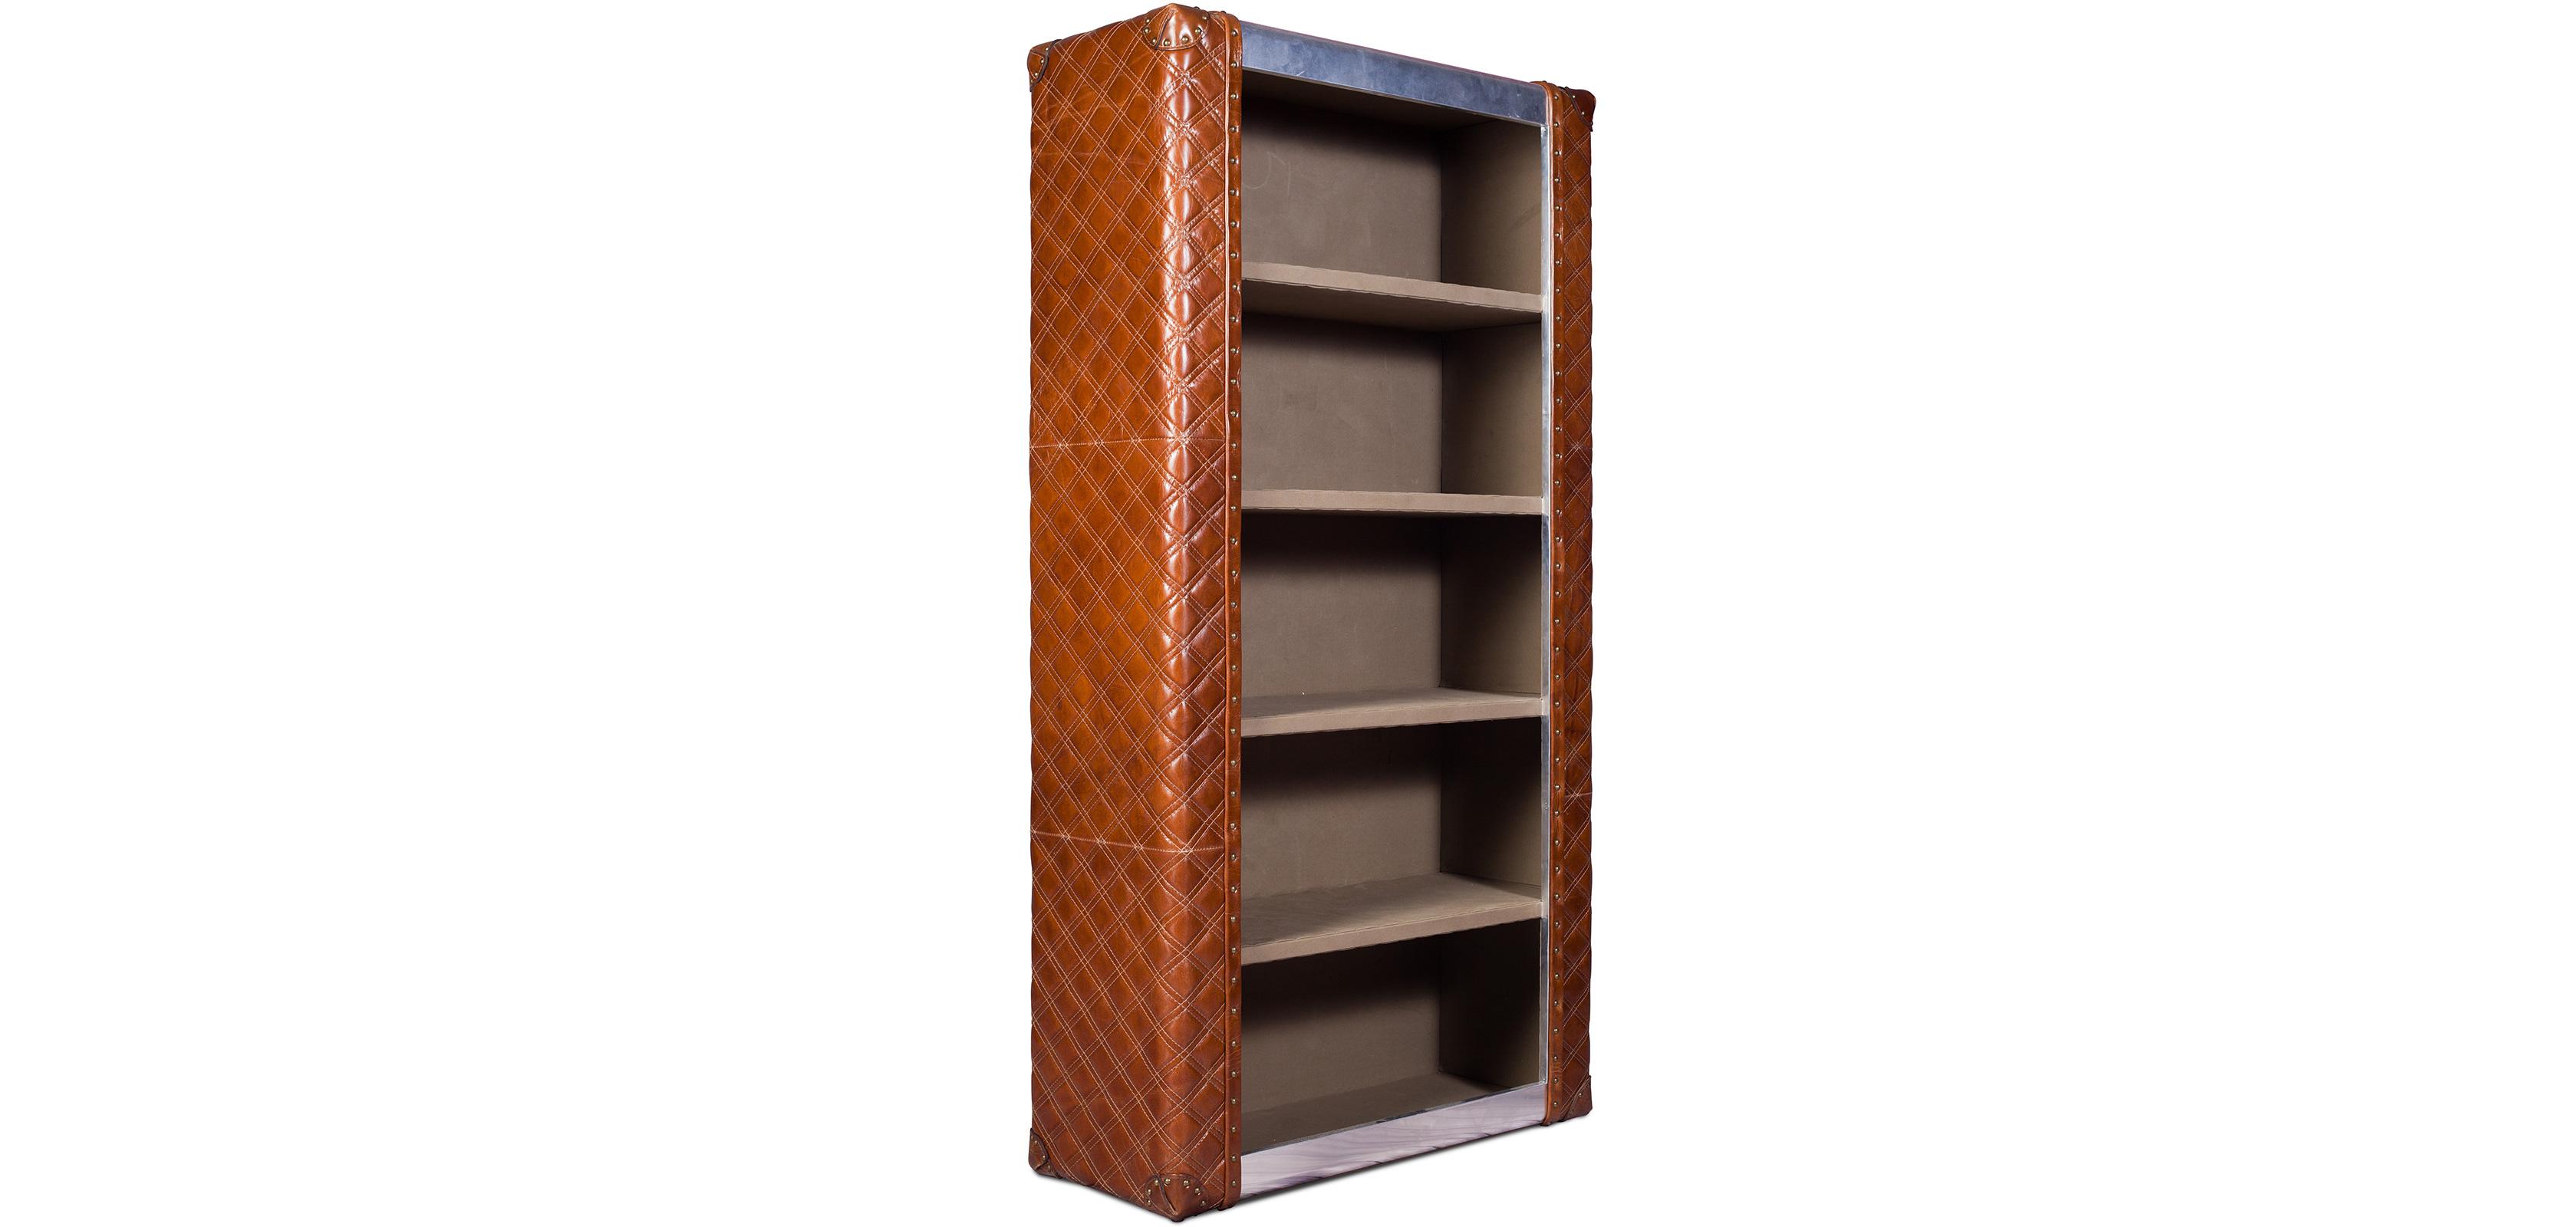 Design Bücherregal Churchill Lounge Hochwertiges